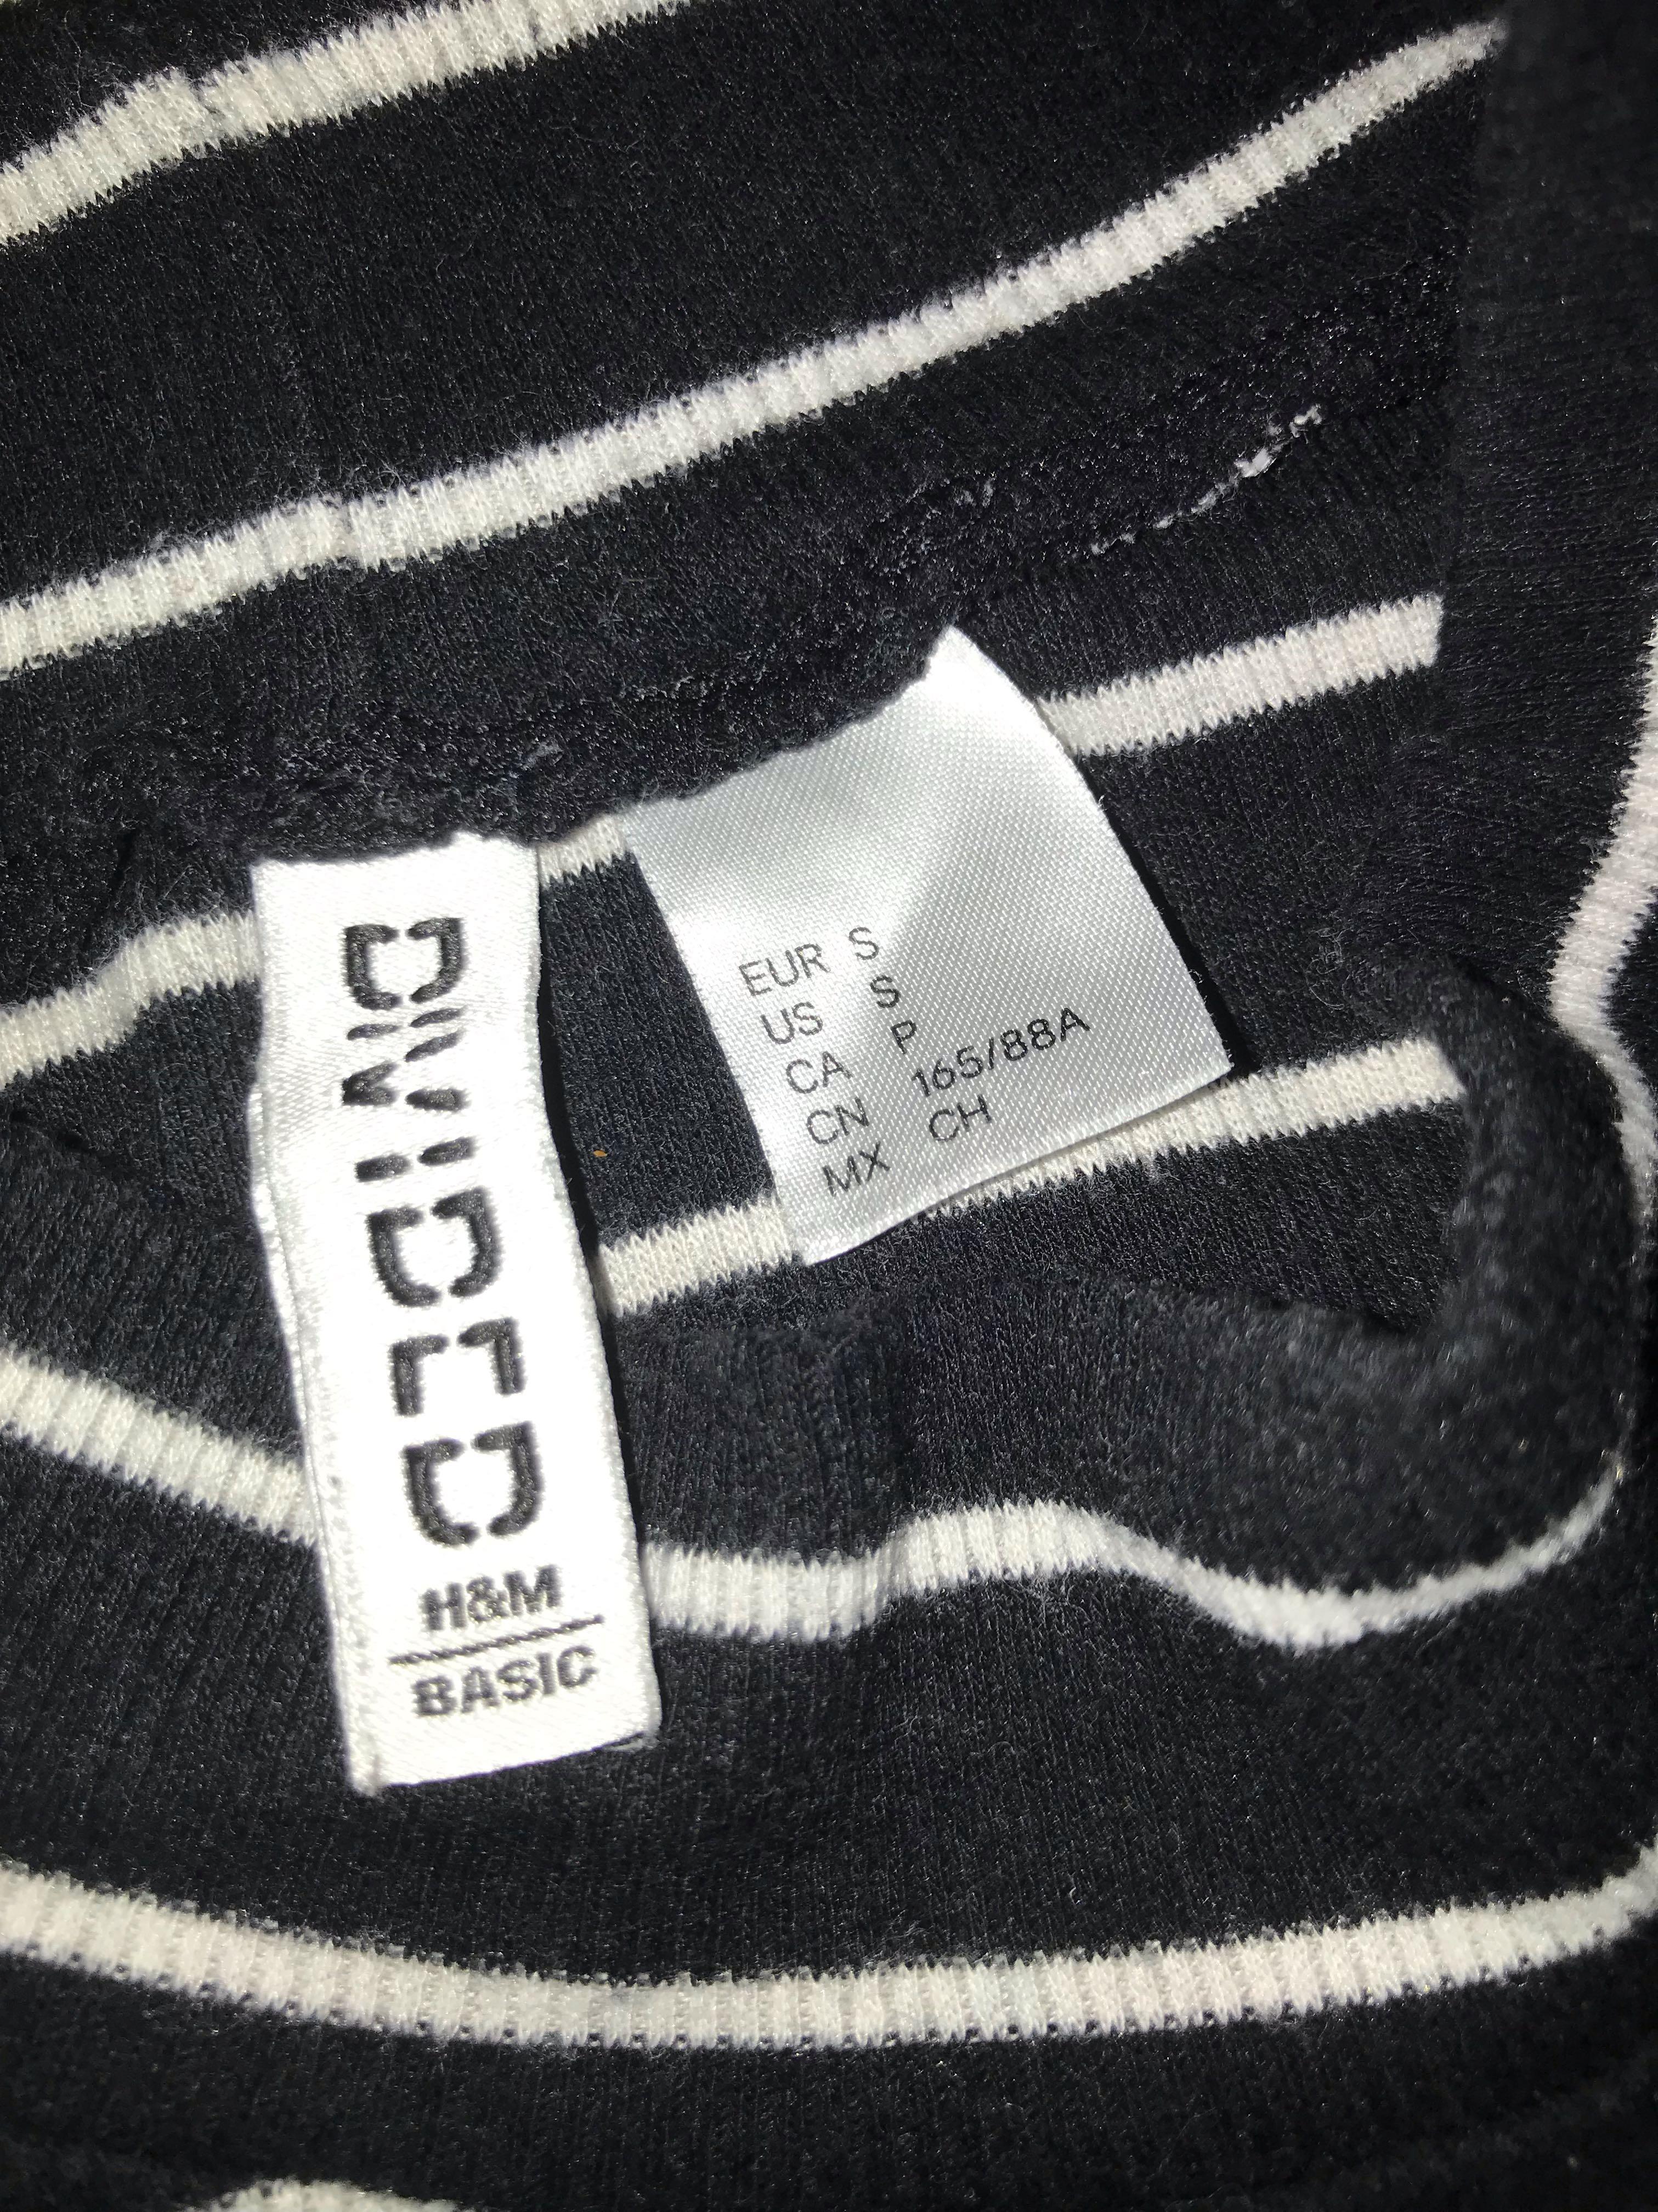 H&M turtleneck bodysuit